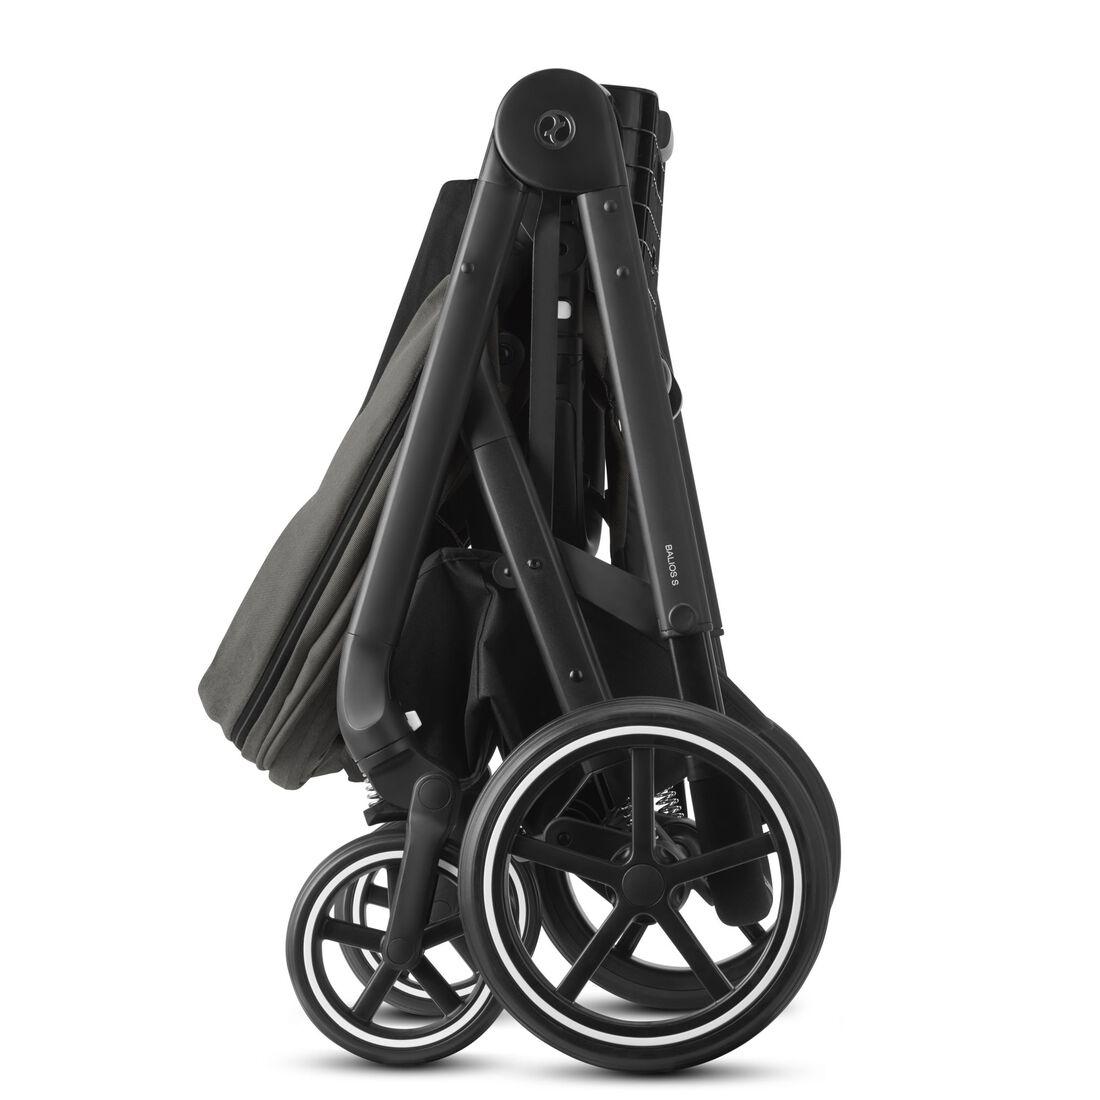 CYBEX Balios S Lux - Soho Grey (Black Frame) in Soho Grey (Black Frame) large image number 7